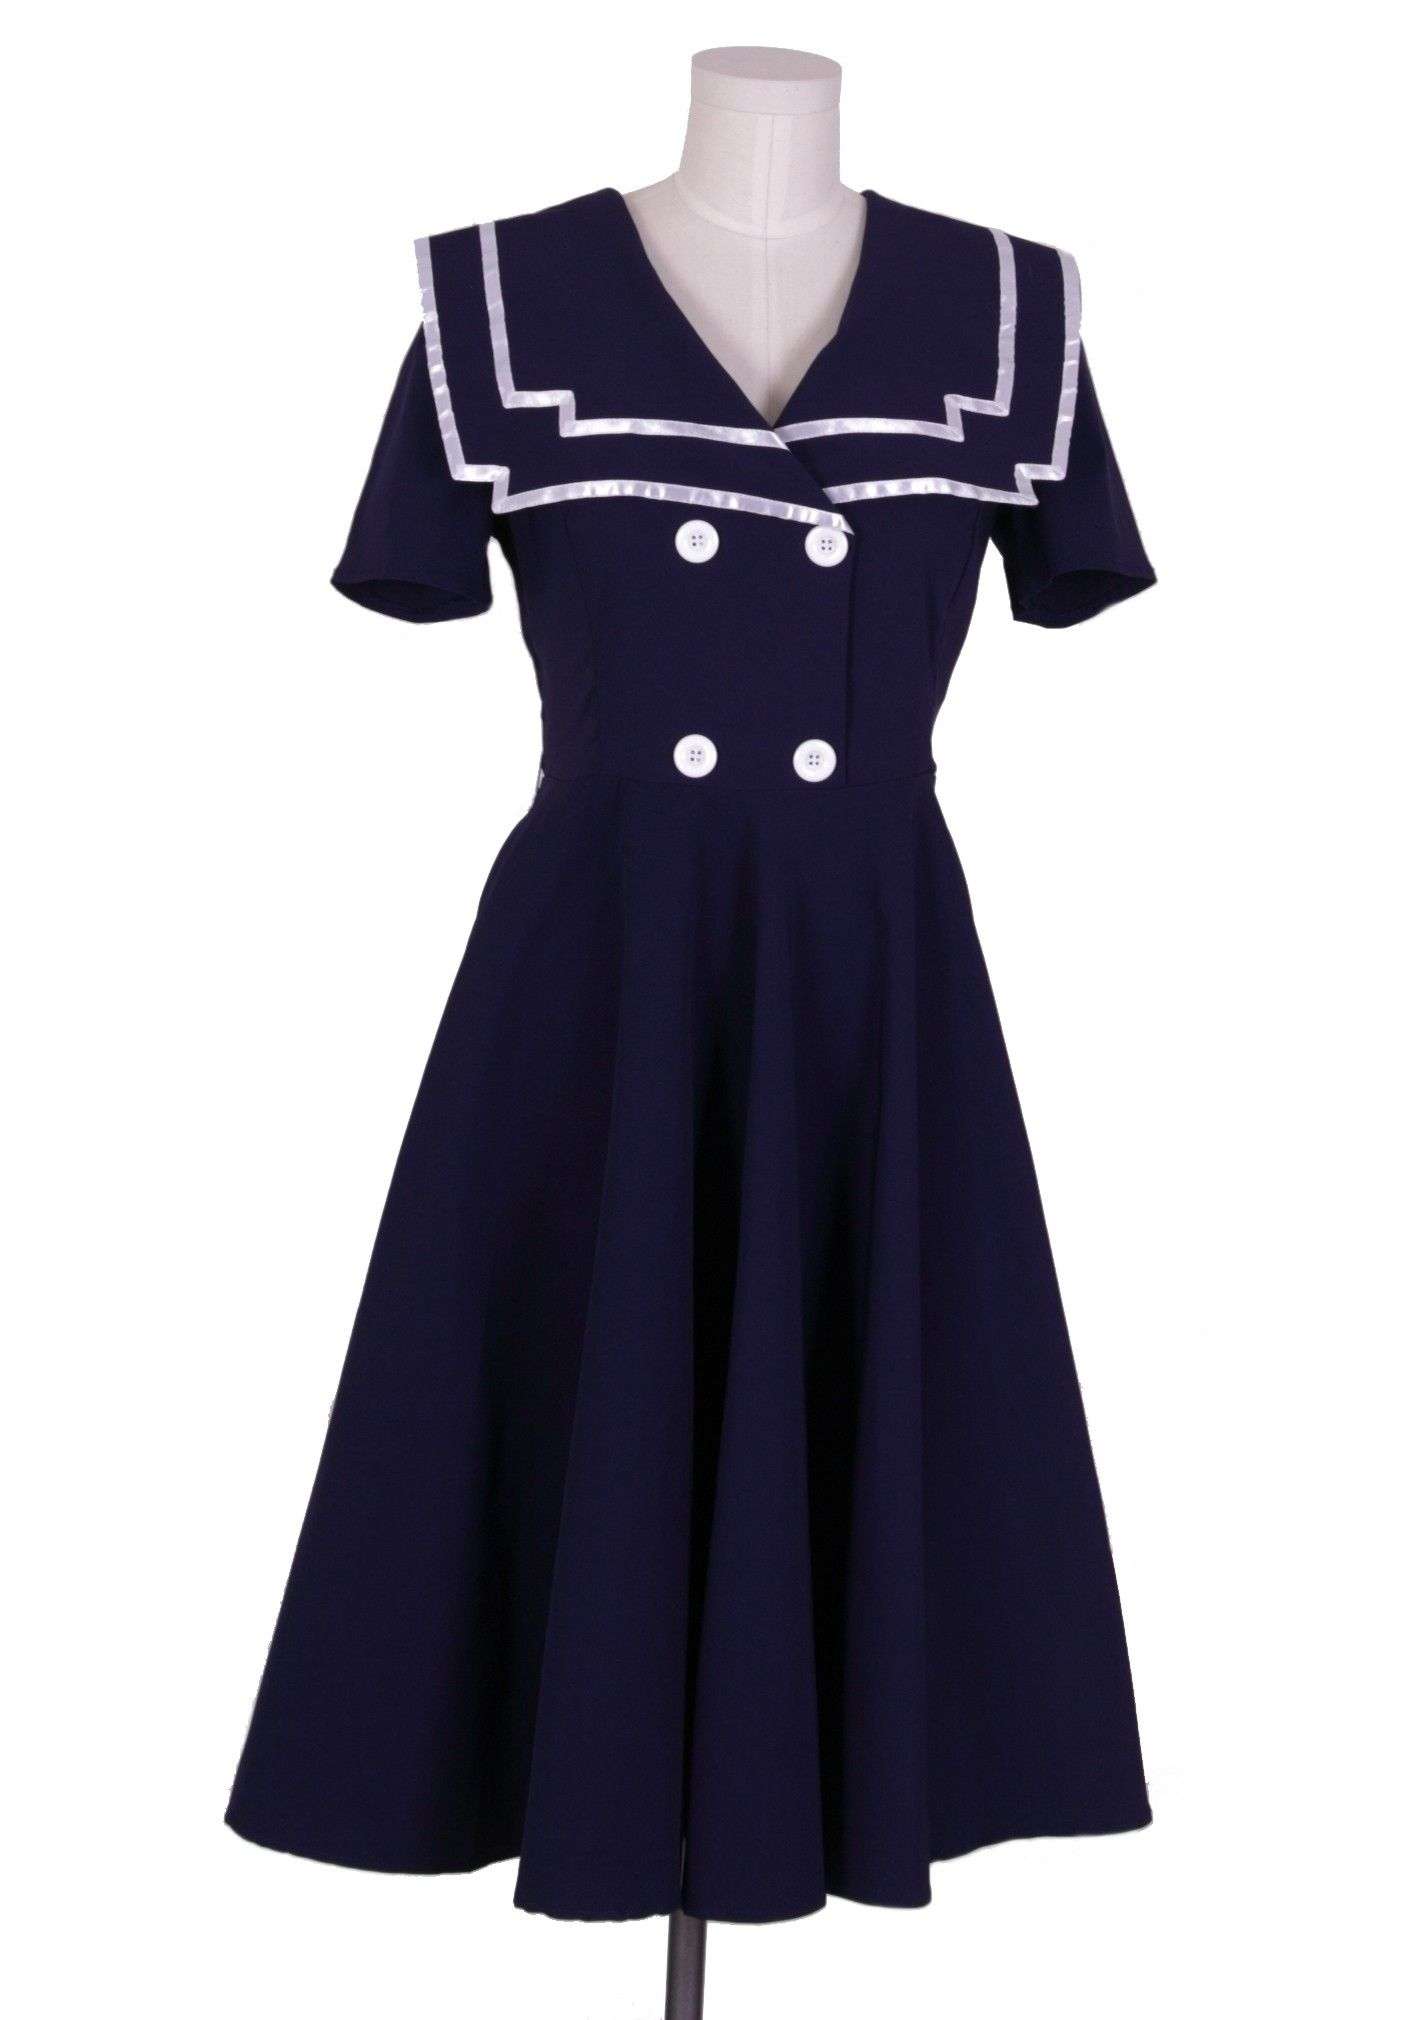 1940s Sails Through Sophistication Vintage Navy Dress Sailor Dress Vintage Dresses 1950s Rockabilly Dress